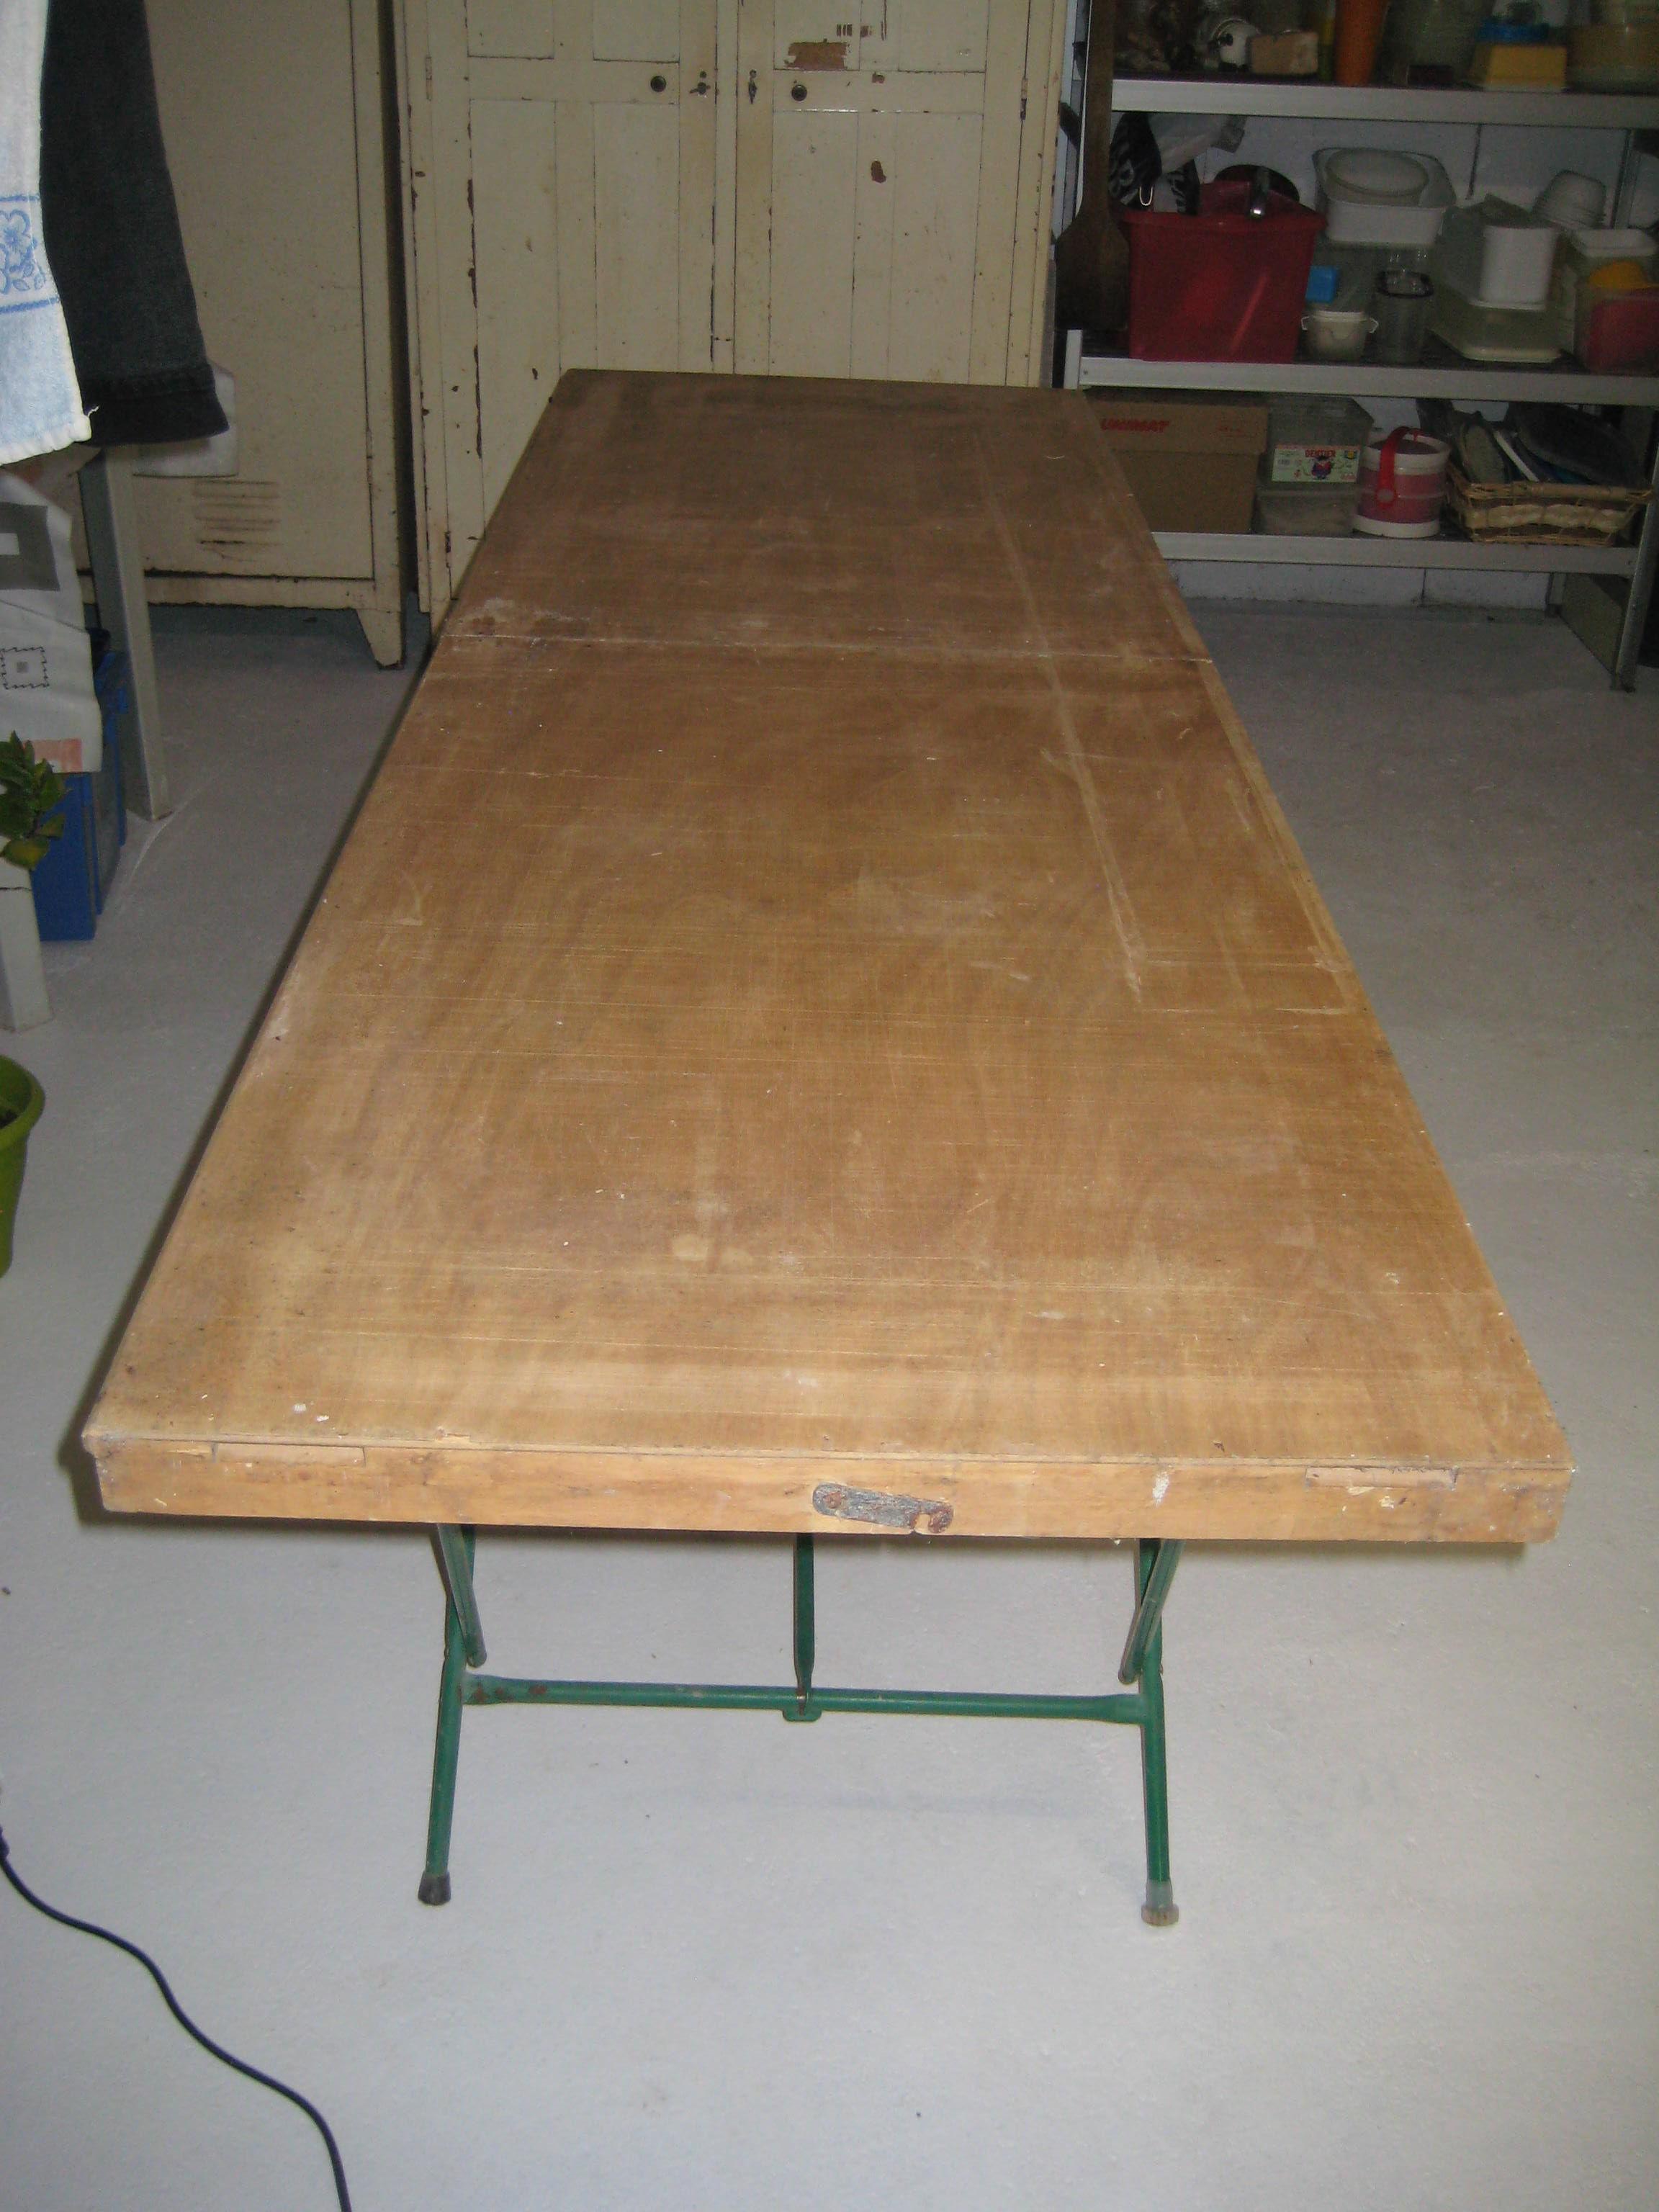 Achetez Table A Tapisser Pro Occasion Annonce Vente A Sainte